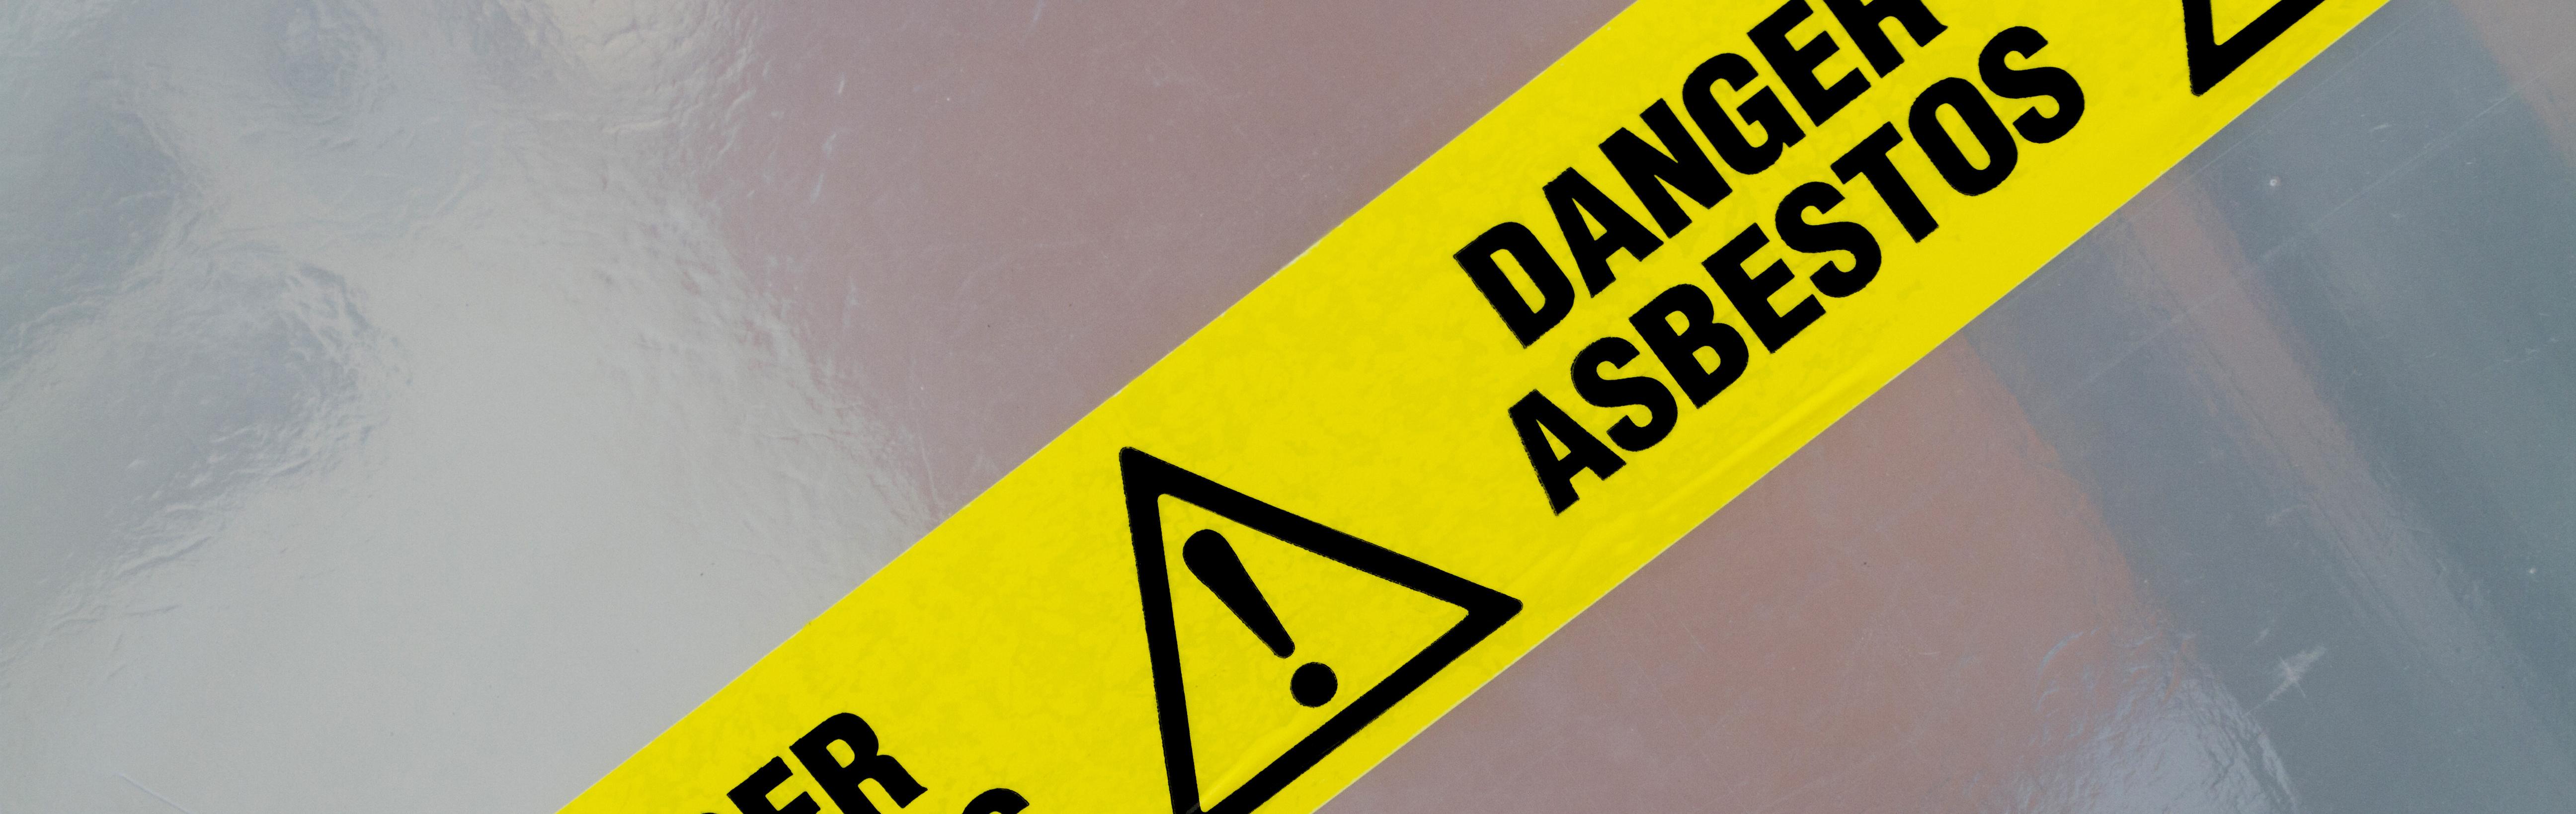 Safe, effective asbestos removal in Taranaki